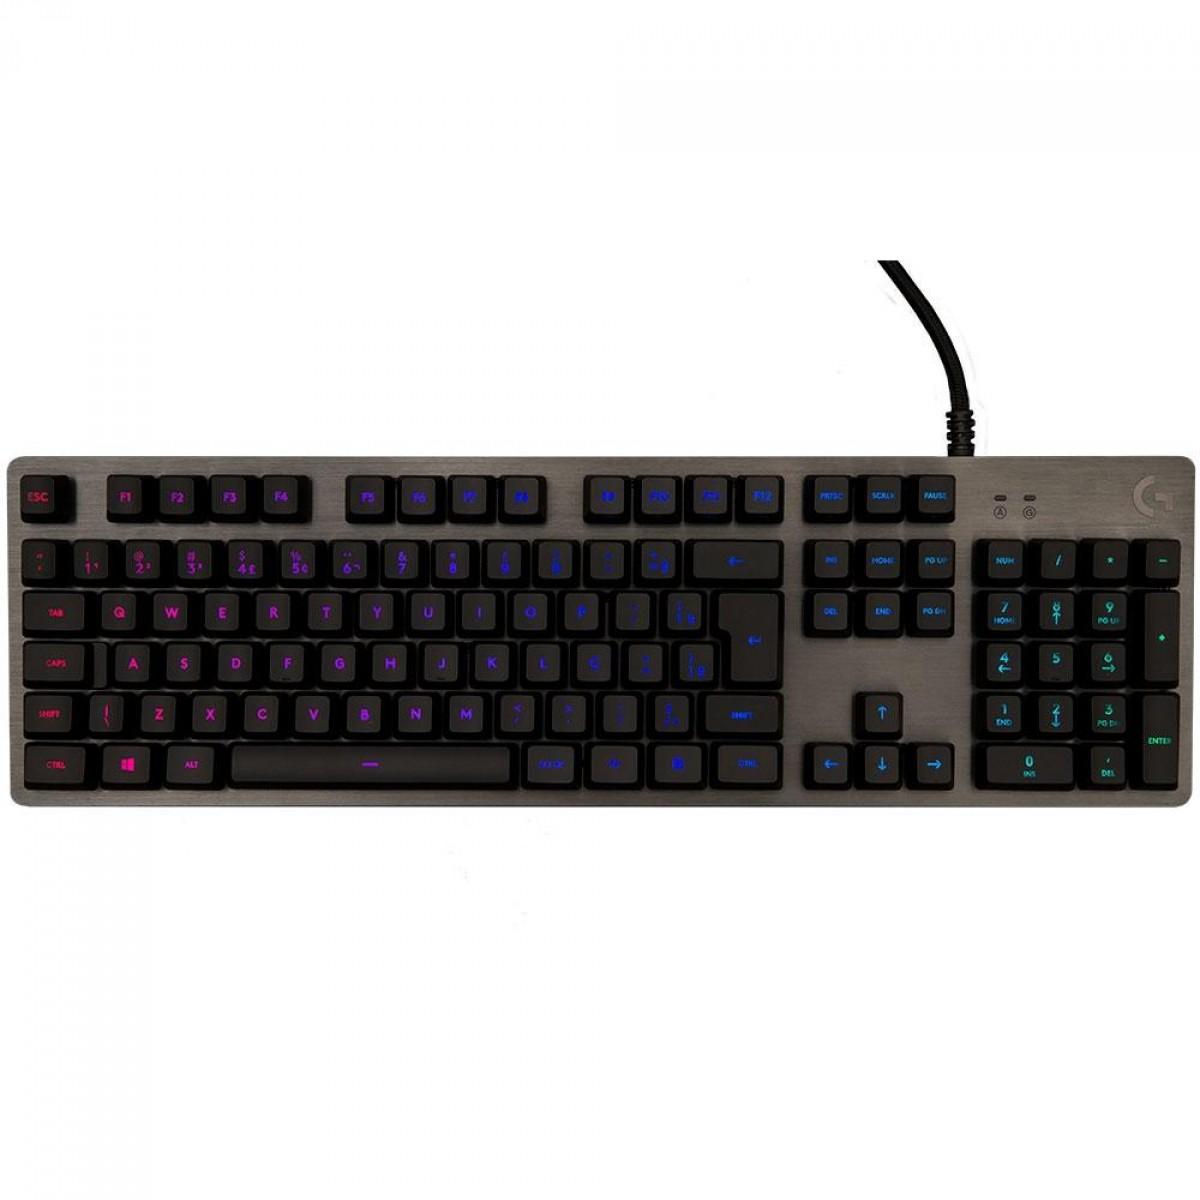 Teclado Gamer Mecânico Logitech G512, Switch Brown, RGB, ABNT2, Carbon, 920-009400